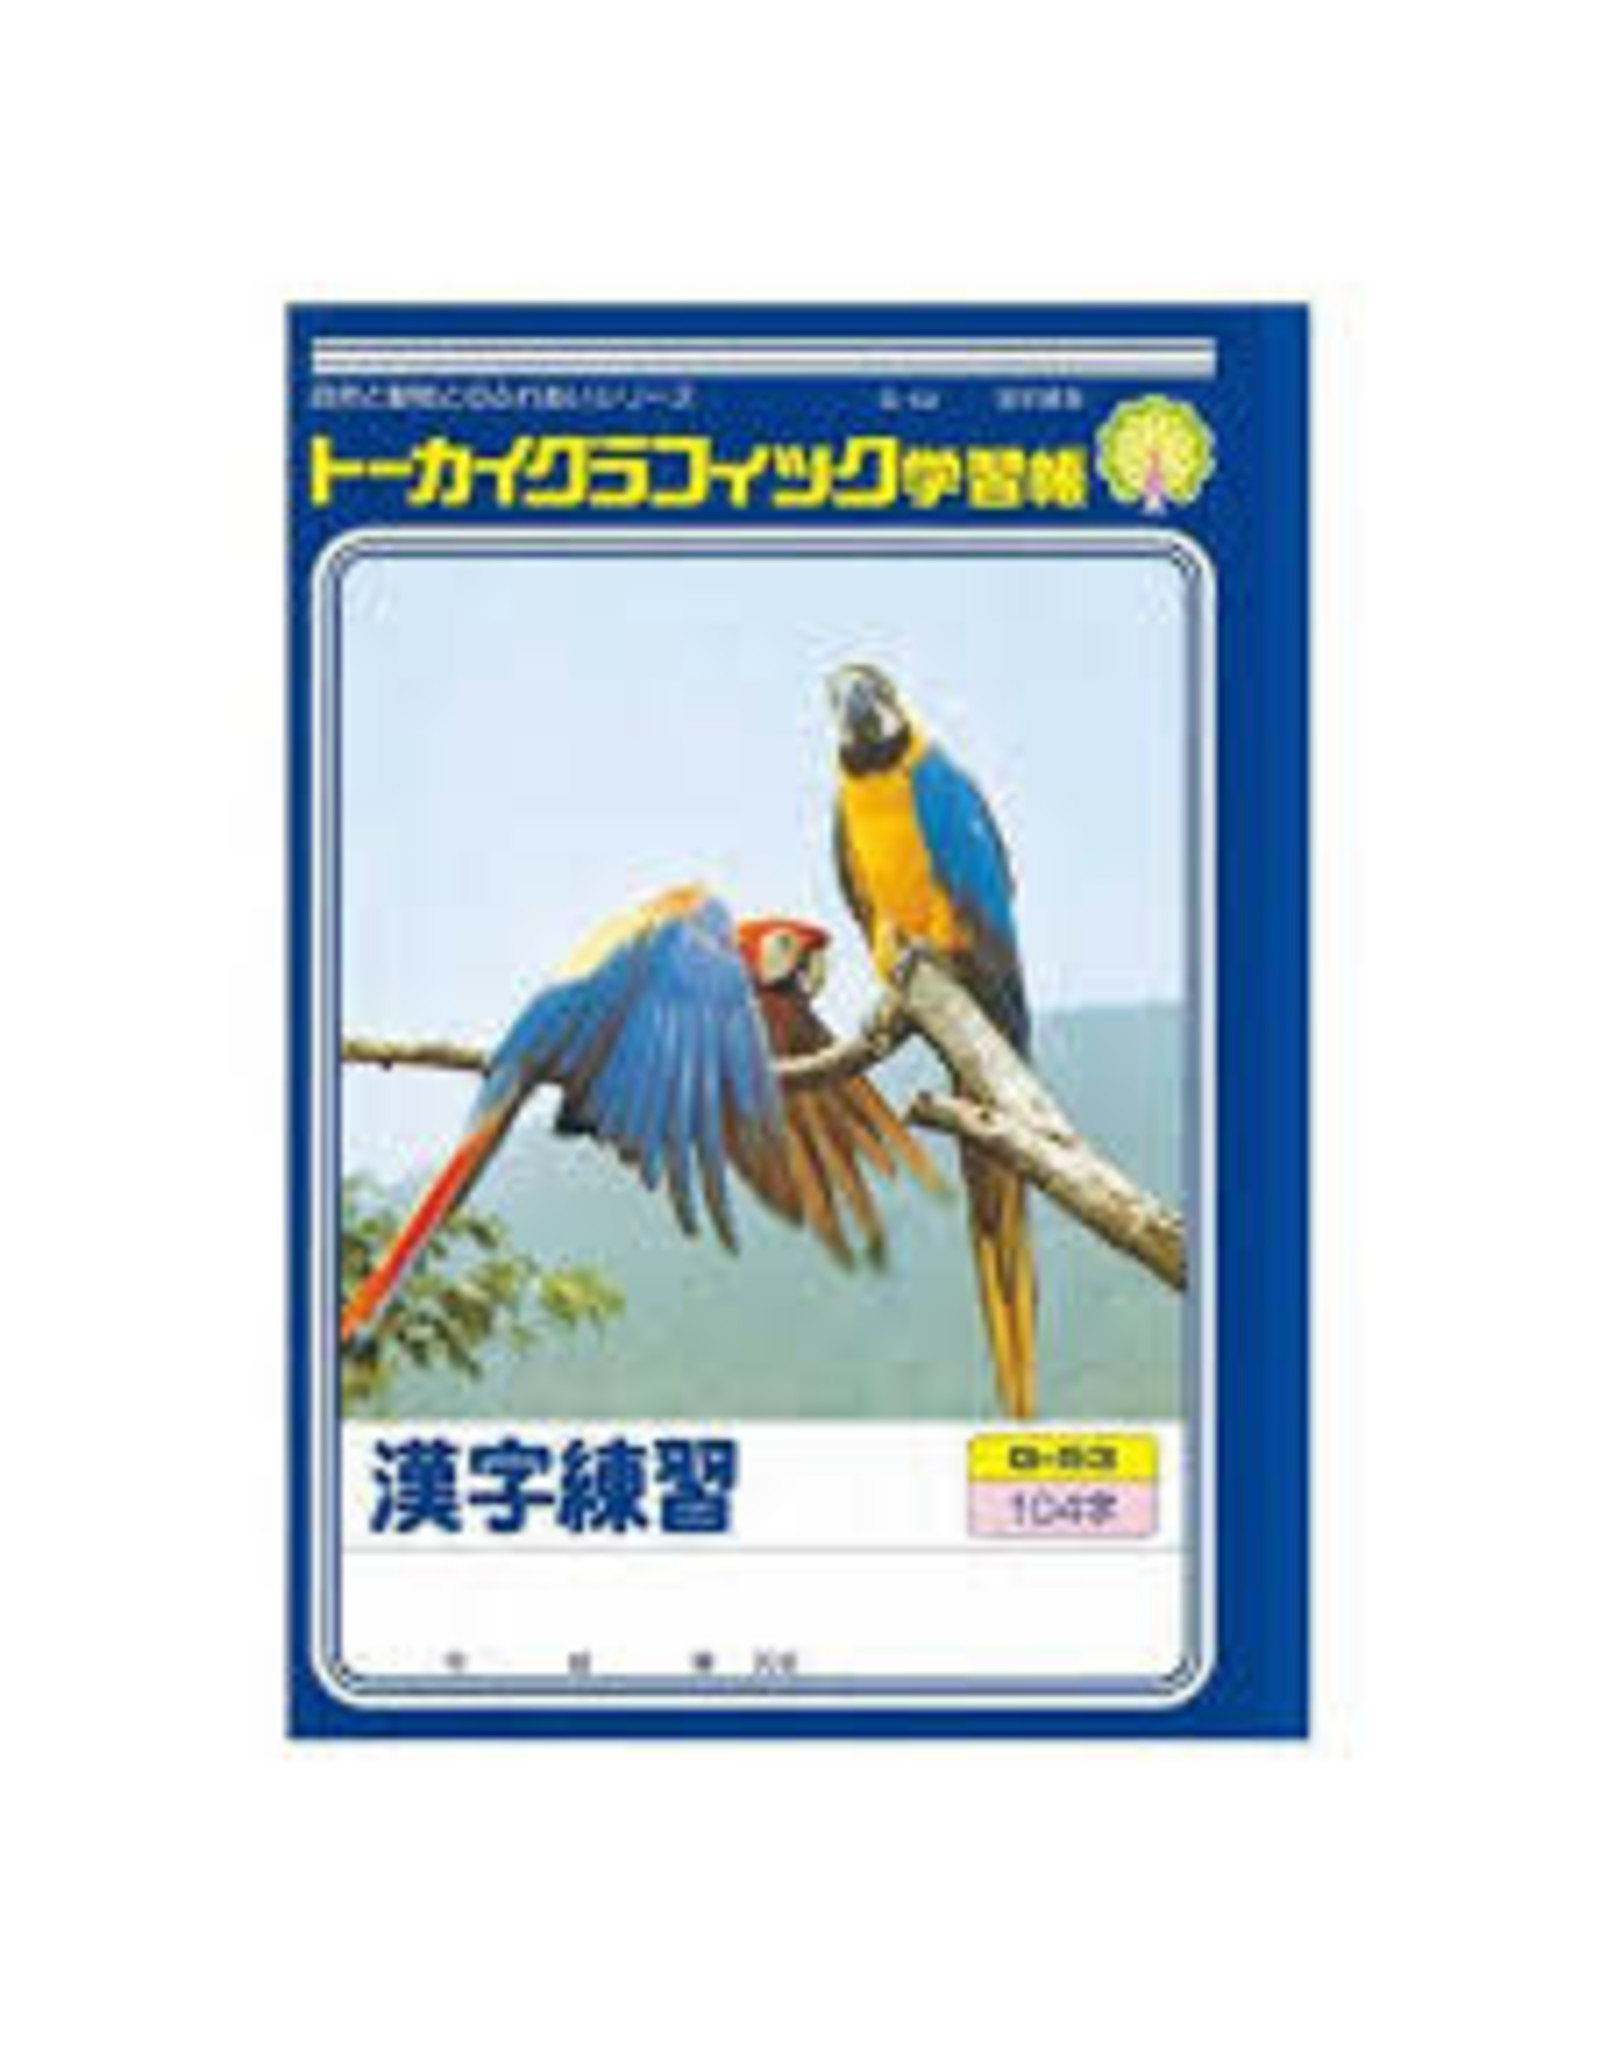 APICA Co., Ltd. APICA KANJI PRACTICE NOTEBOOK 104 WORDS